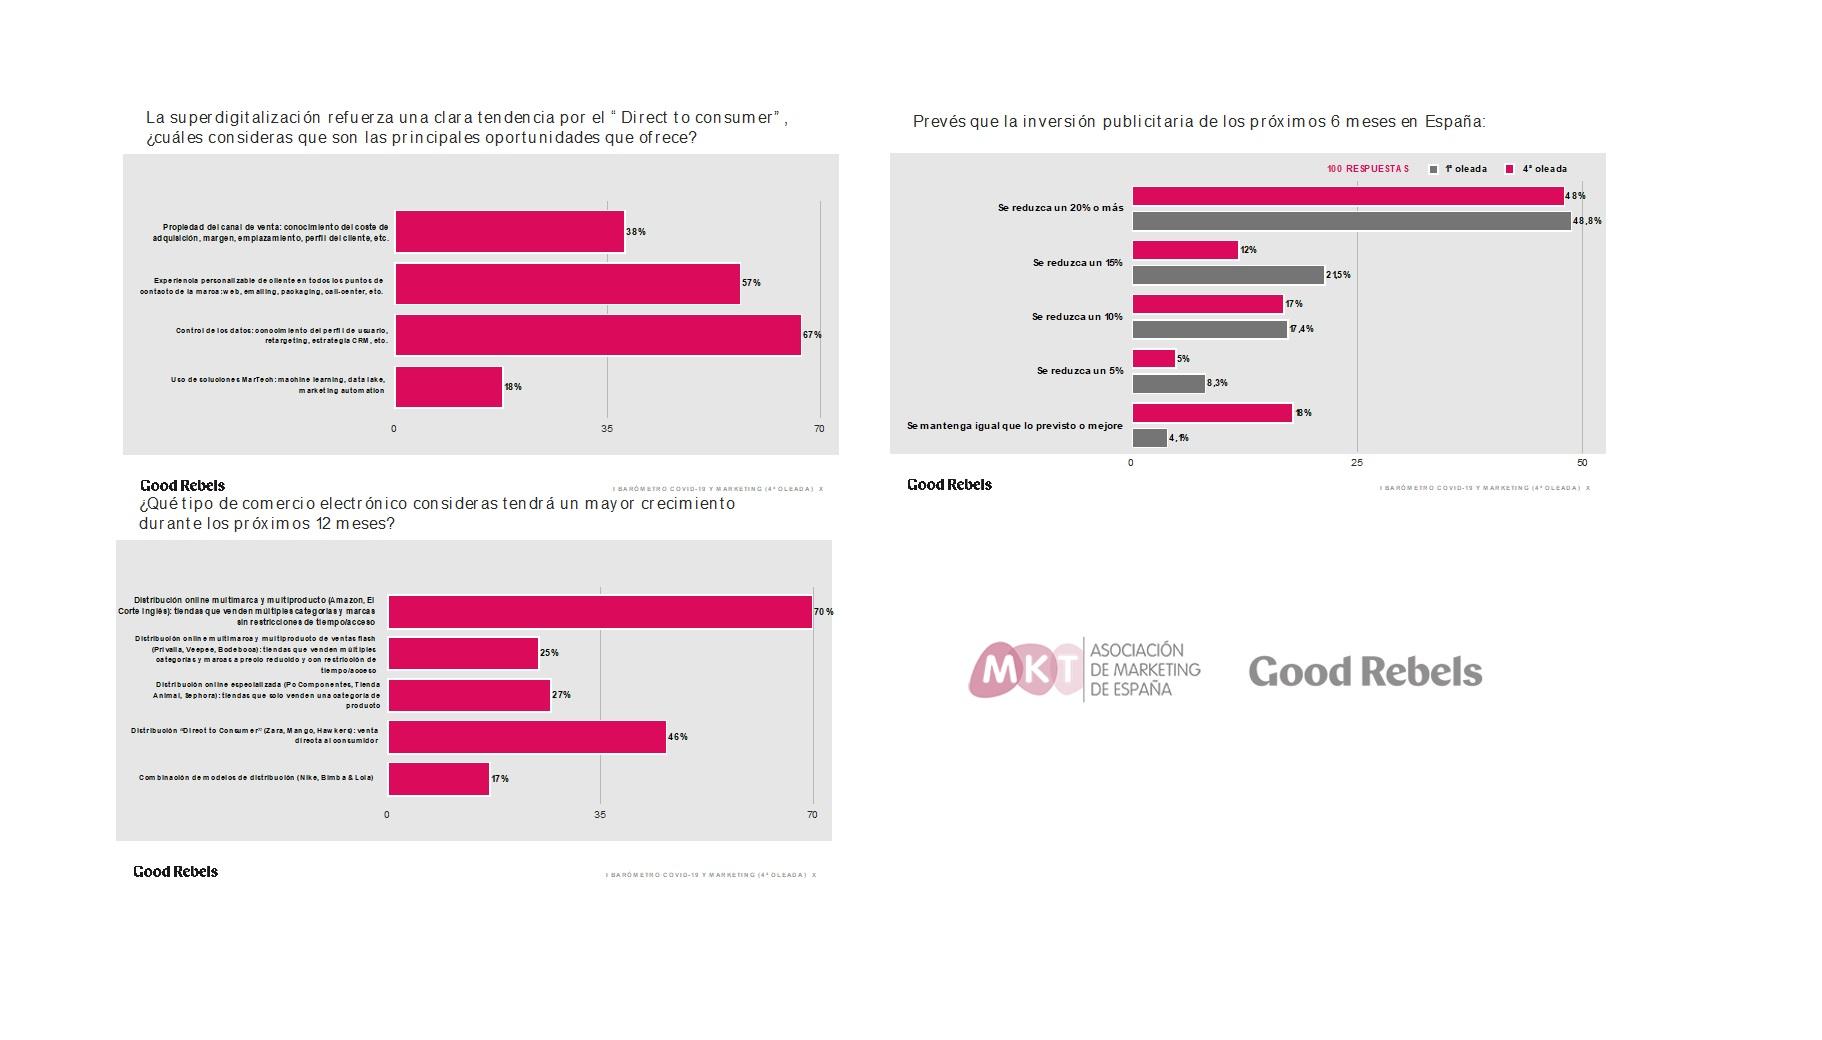 https://www.programapublicidad.com/wp-content/uploads/2020/05/4ª-oleada-I-Barómetro-COVID-19-Marketing-Good-Rebels-mkt-programapublicidad.jpg